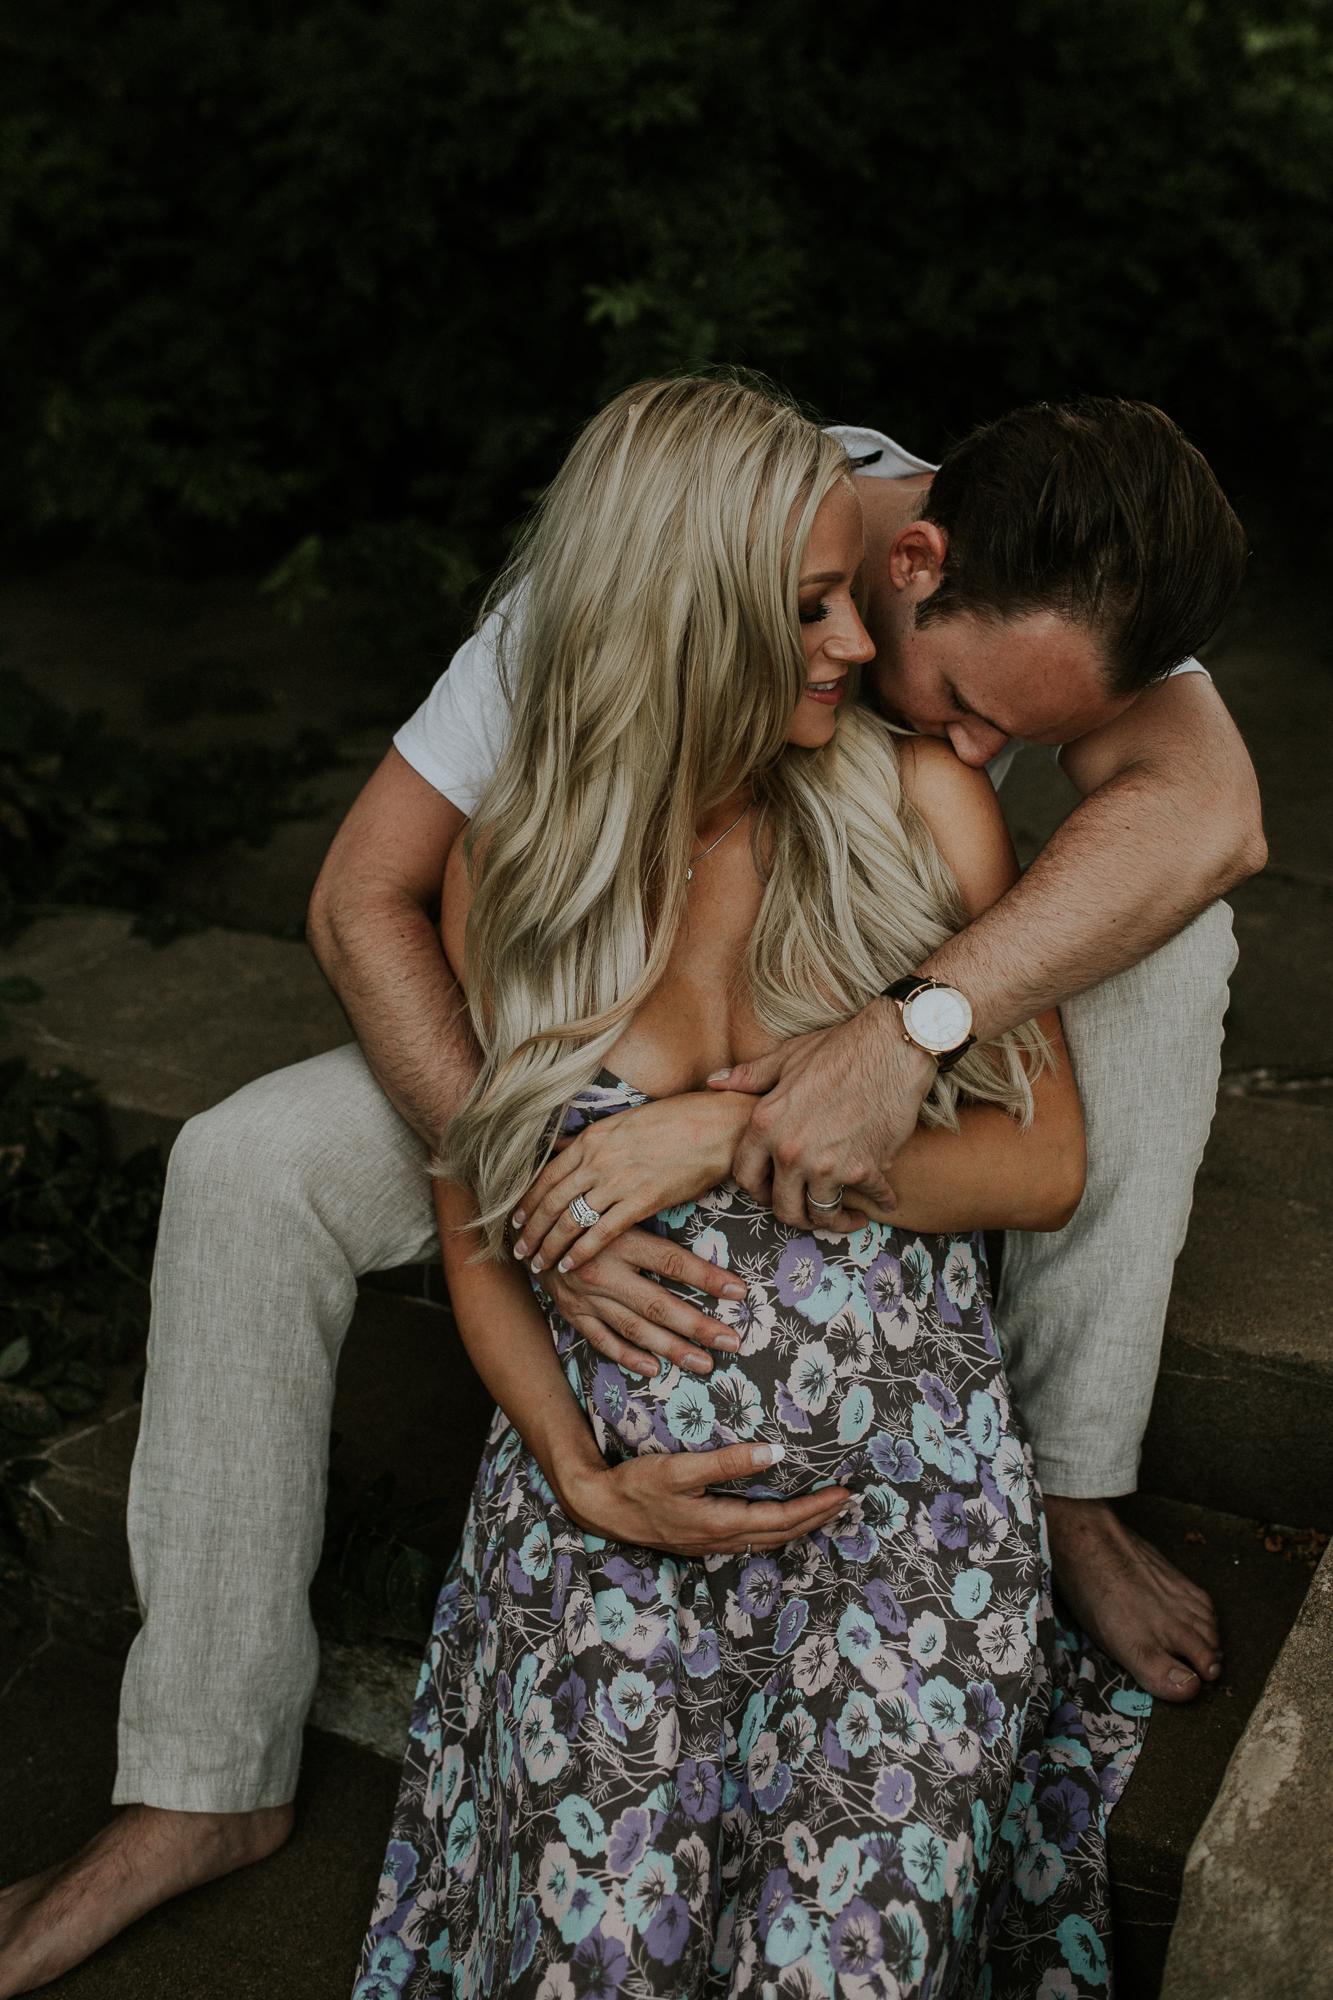 John-Sarah-Maternity-Session-jessesalter.photography-8.jpg